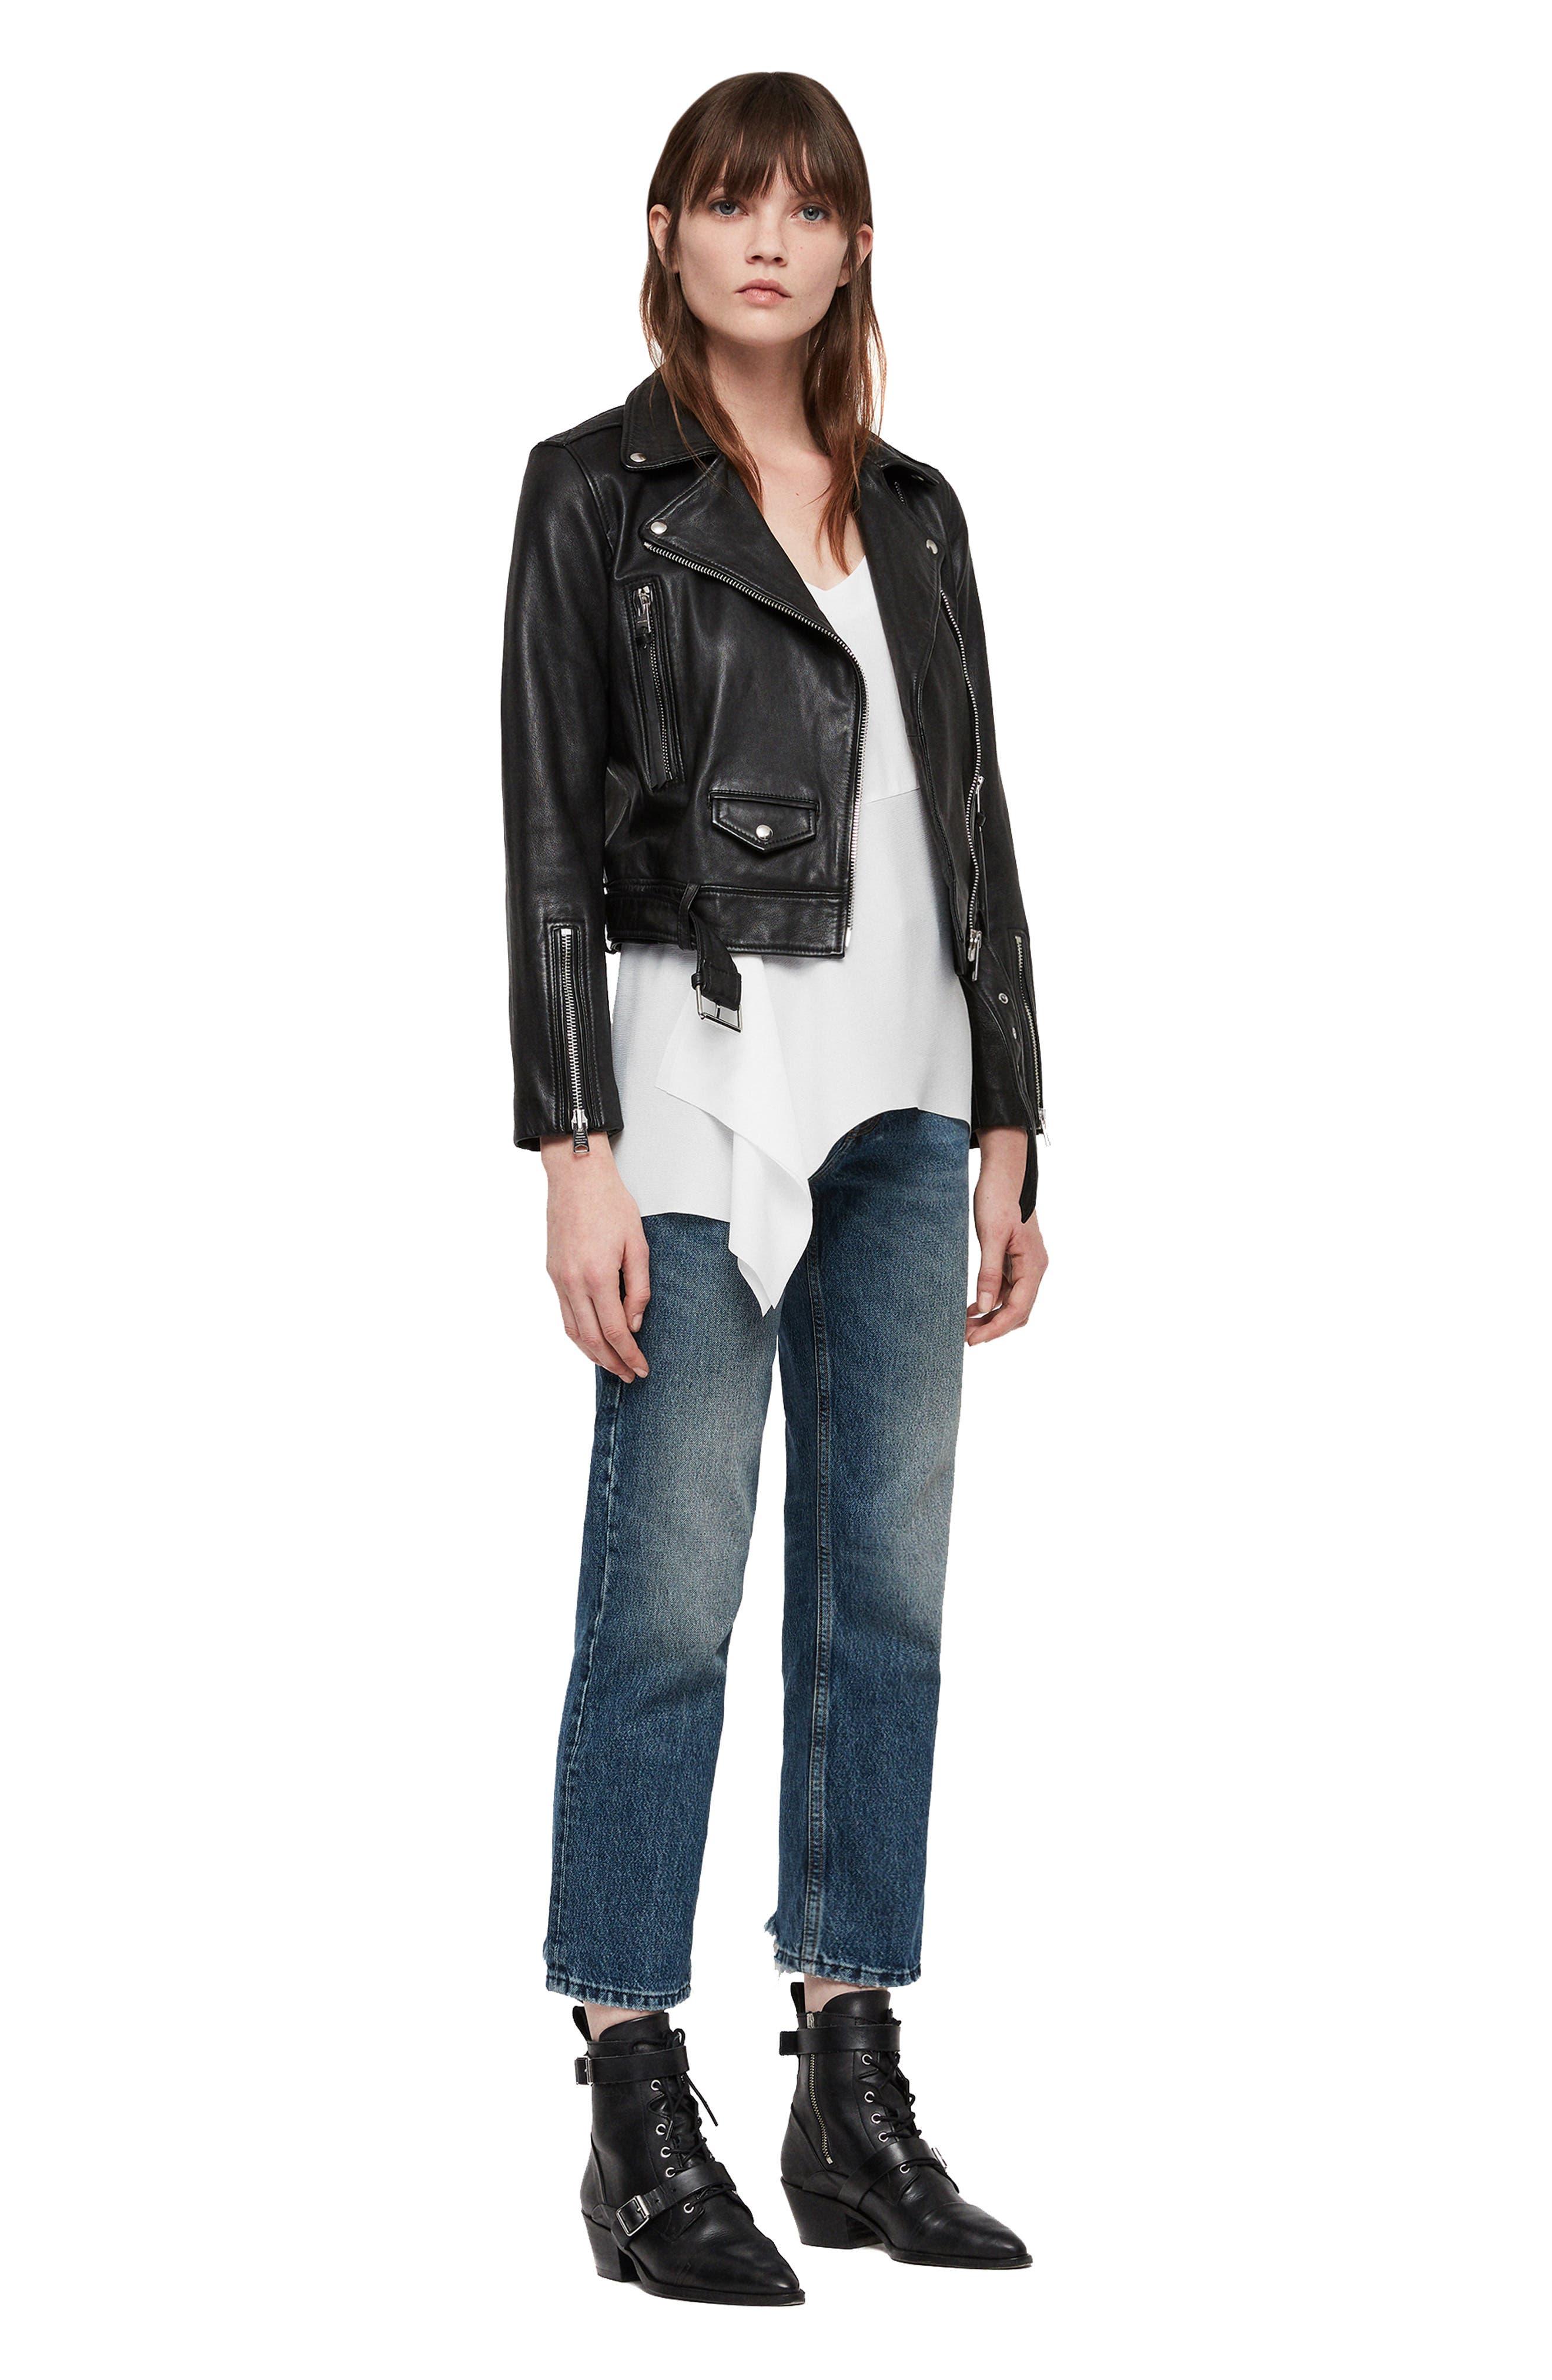 Juno Leather Biker Jacket,                             Alternate thumbnail 8, color,                             BLACK